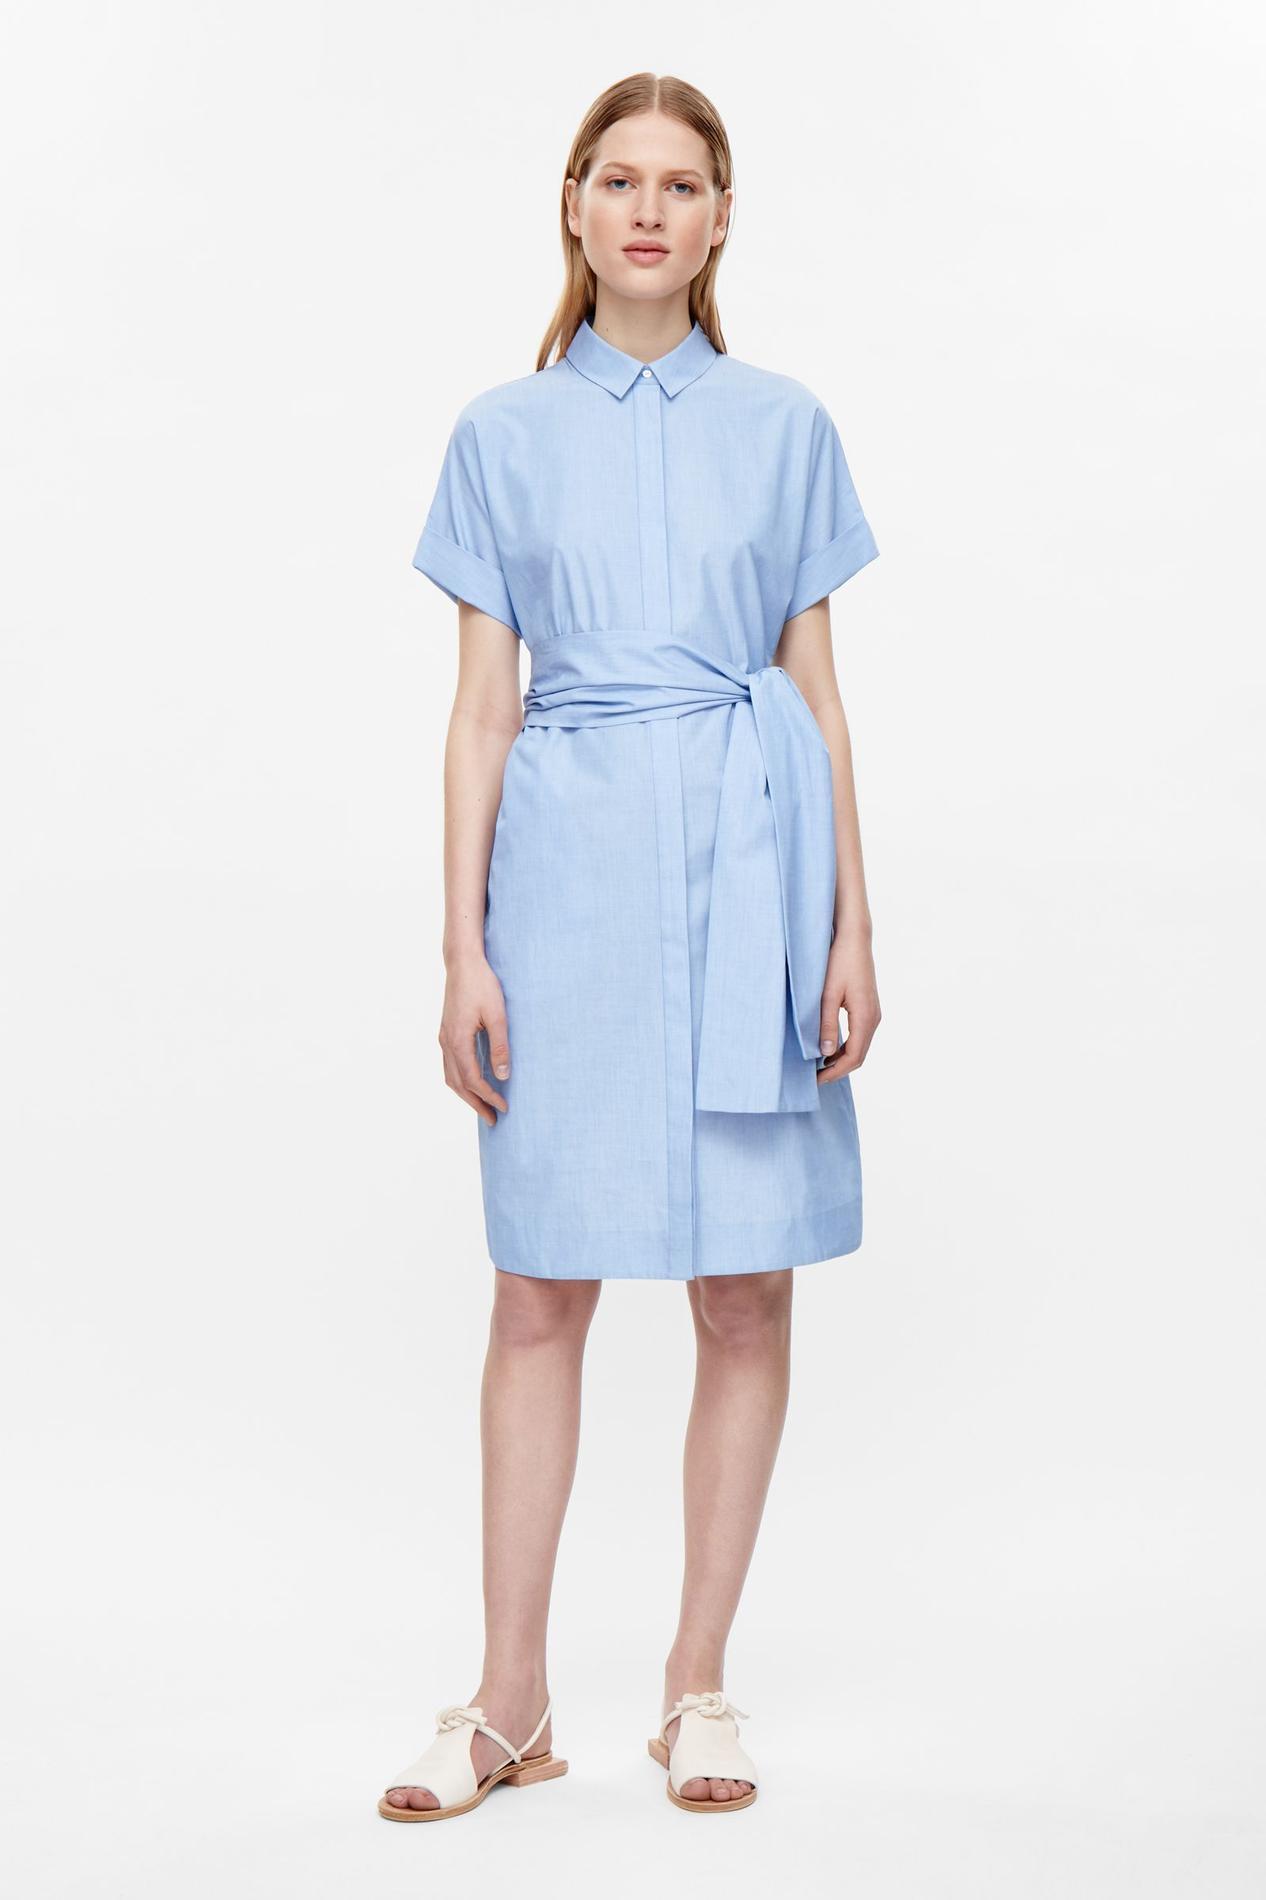 Sleepwear Chemises & sleep dresses from luxury Italian lingerie and apparel designers at Cosabella.